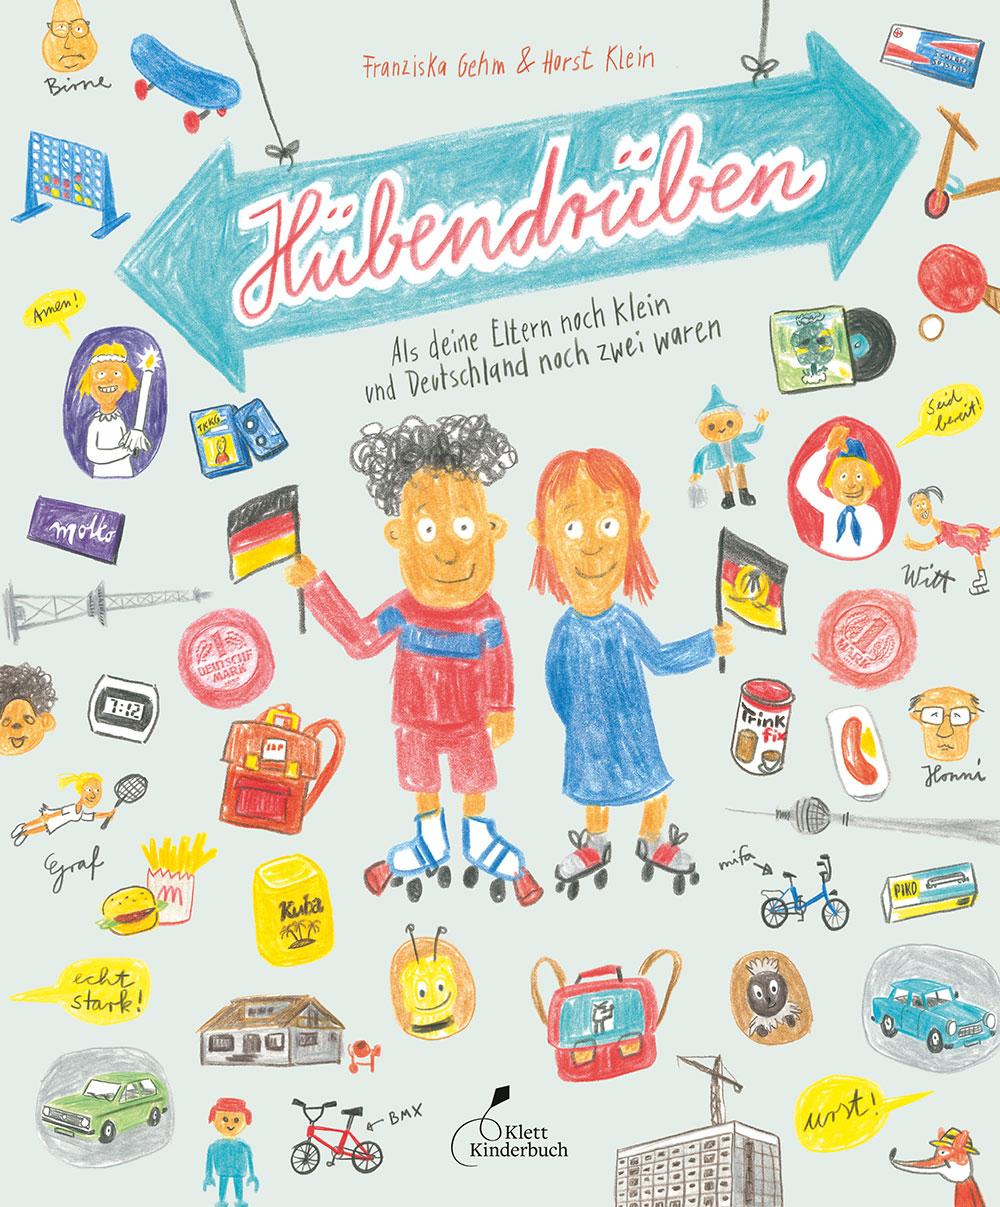 »Hübendrüben« - Klett Kinderbuch